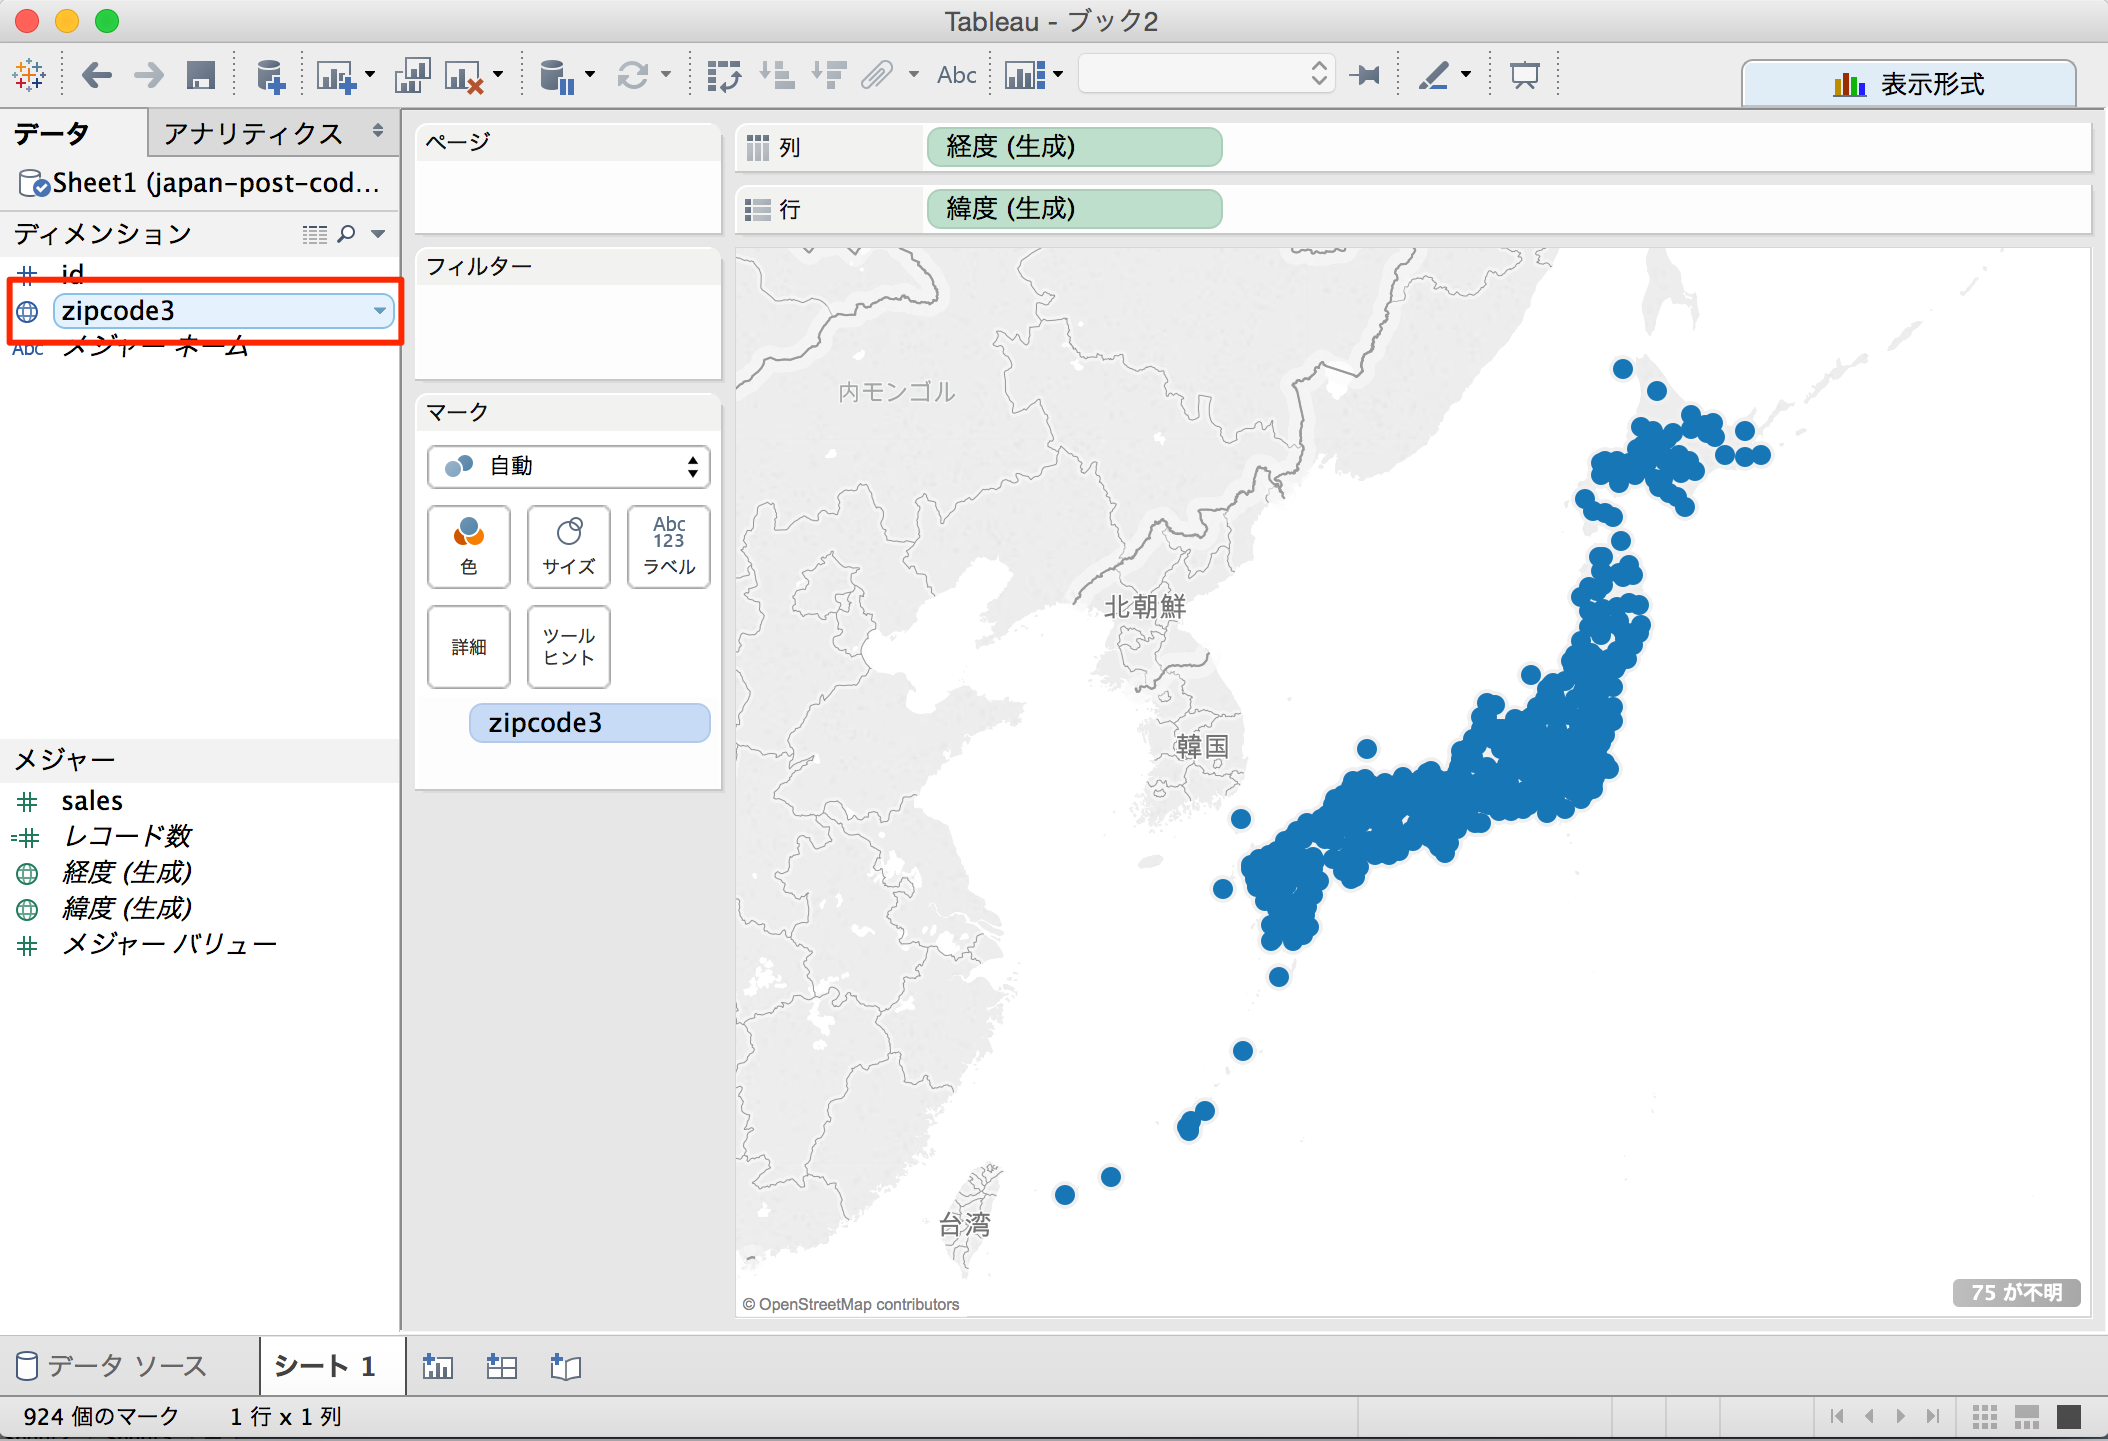 tableau92-japanese-post-code_sample_04